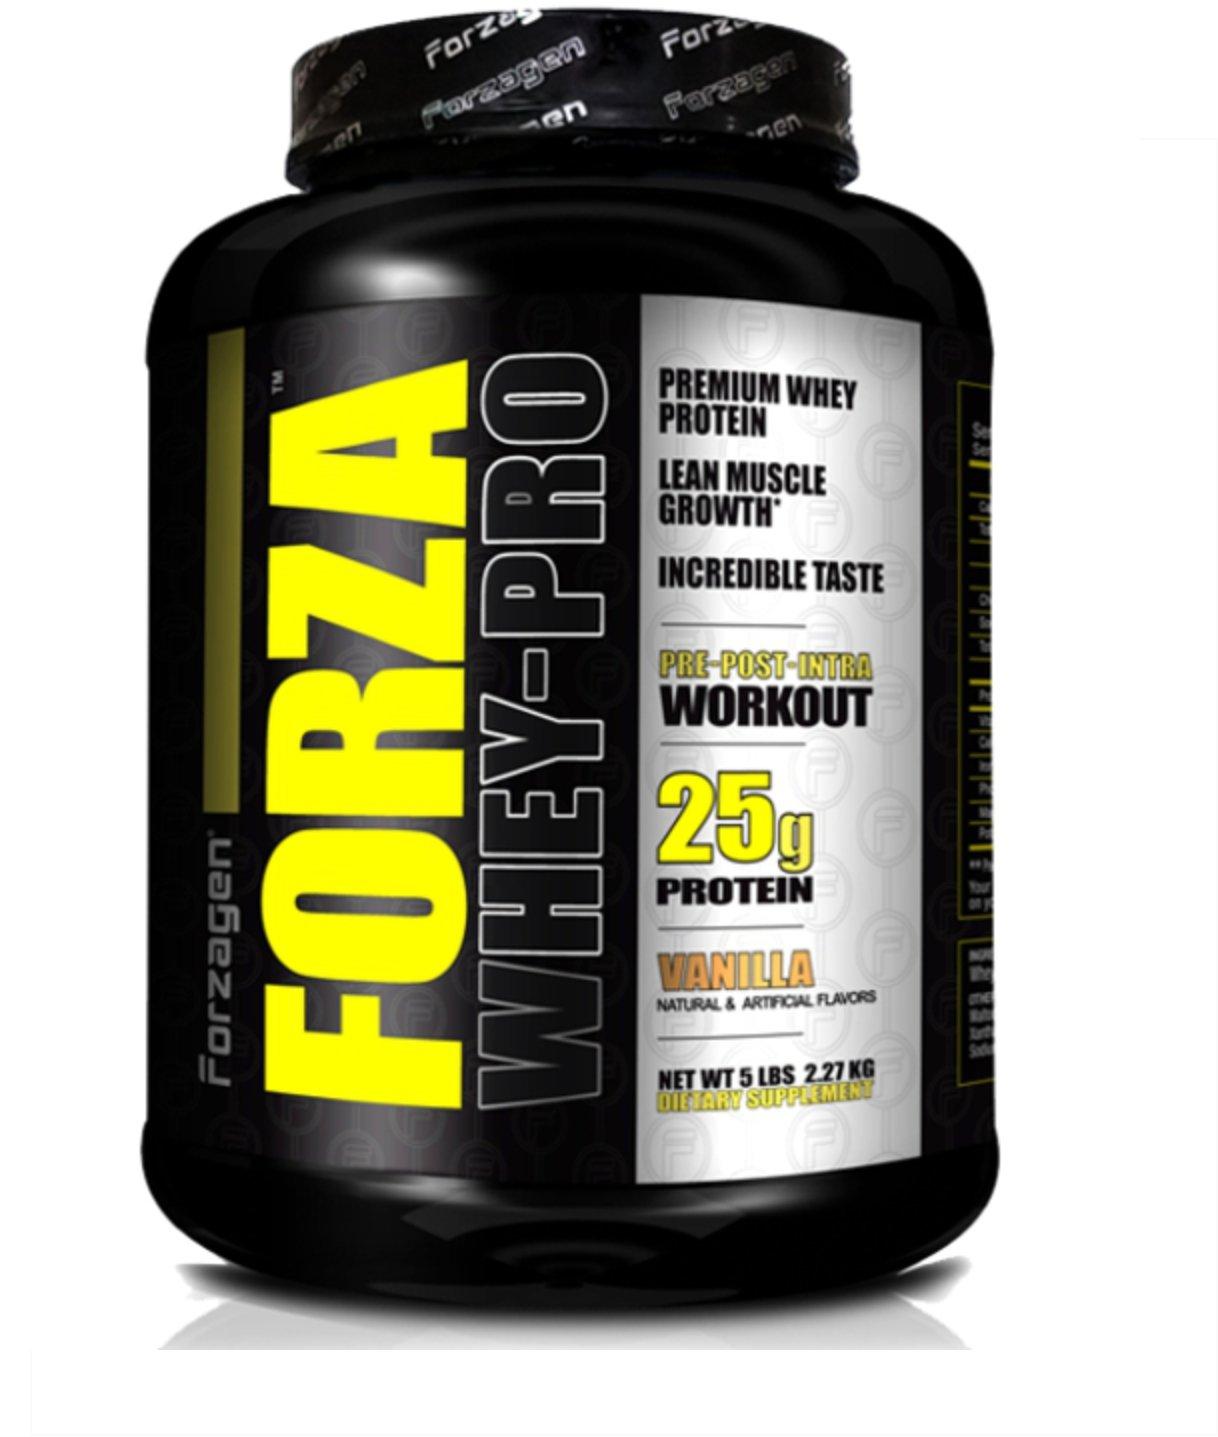 Forzagen Forza Whey-Pro Premium Whey Protein 25 g Protein (5 Lb, Vanilla)